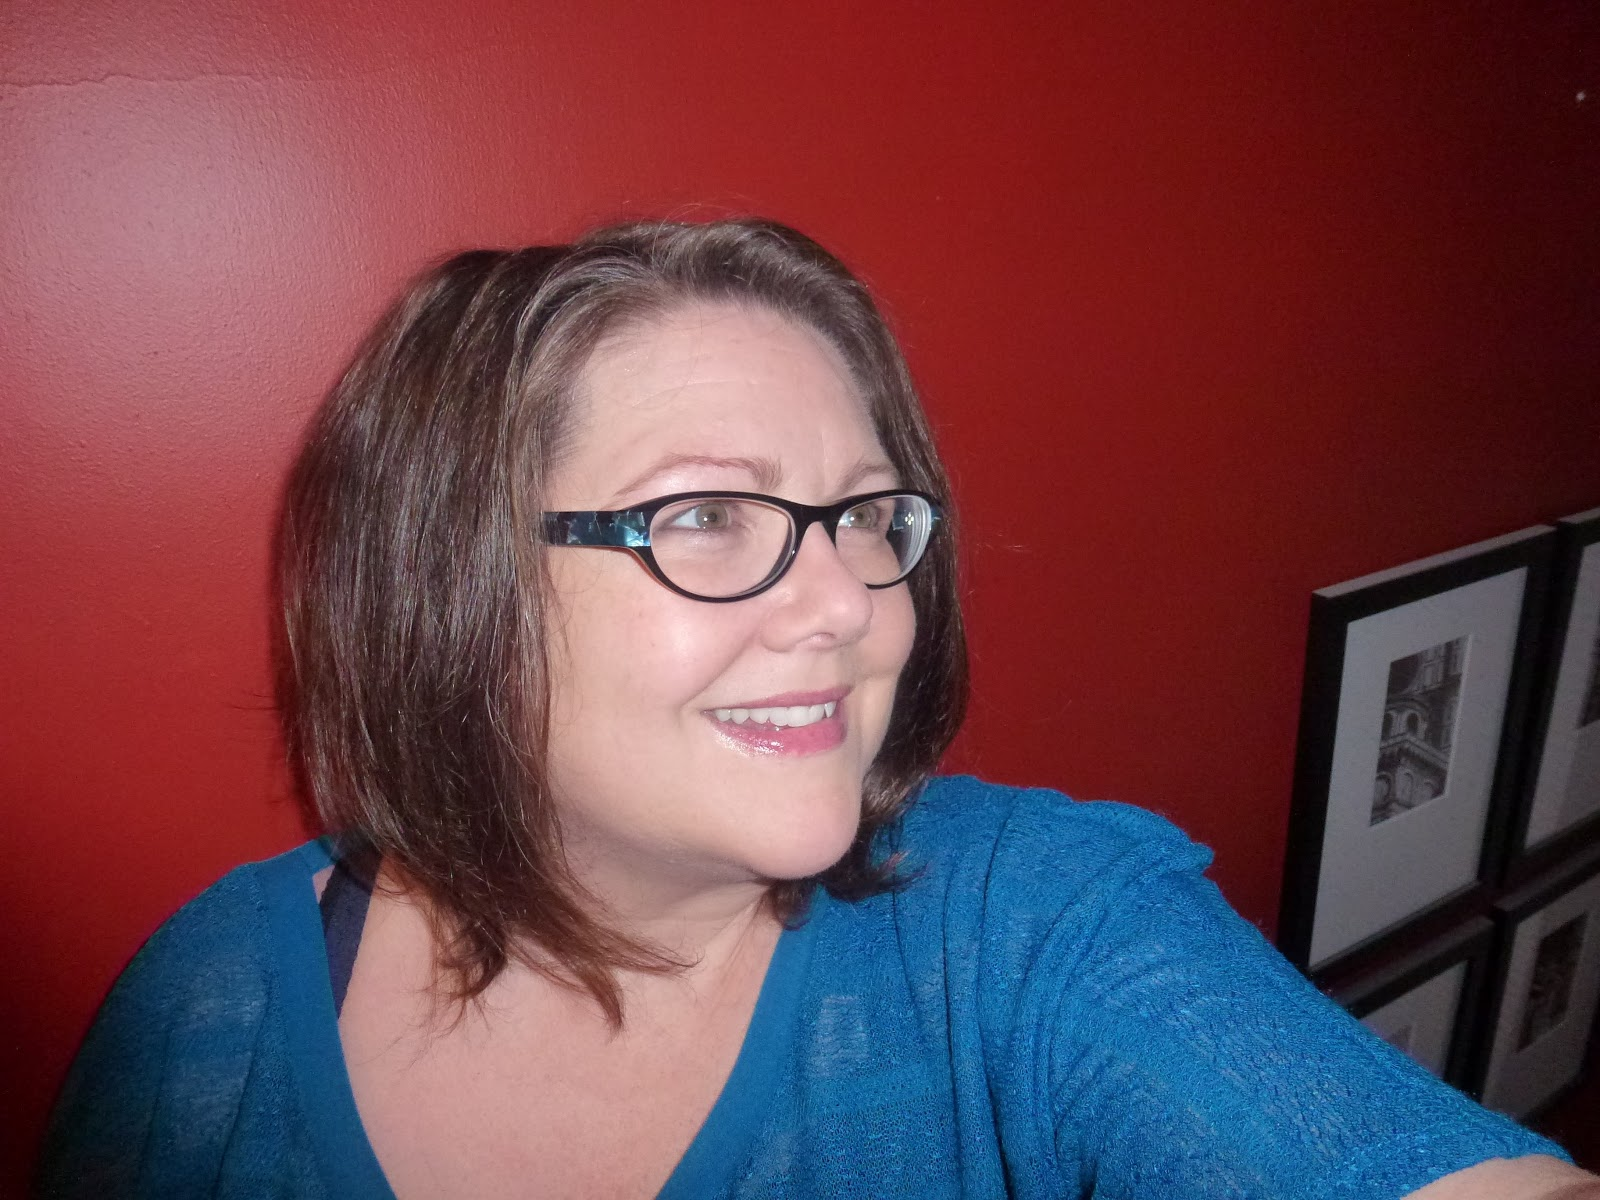 Litonya Knelsen - Darting H-Bird: Blog